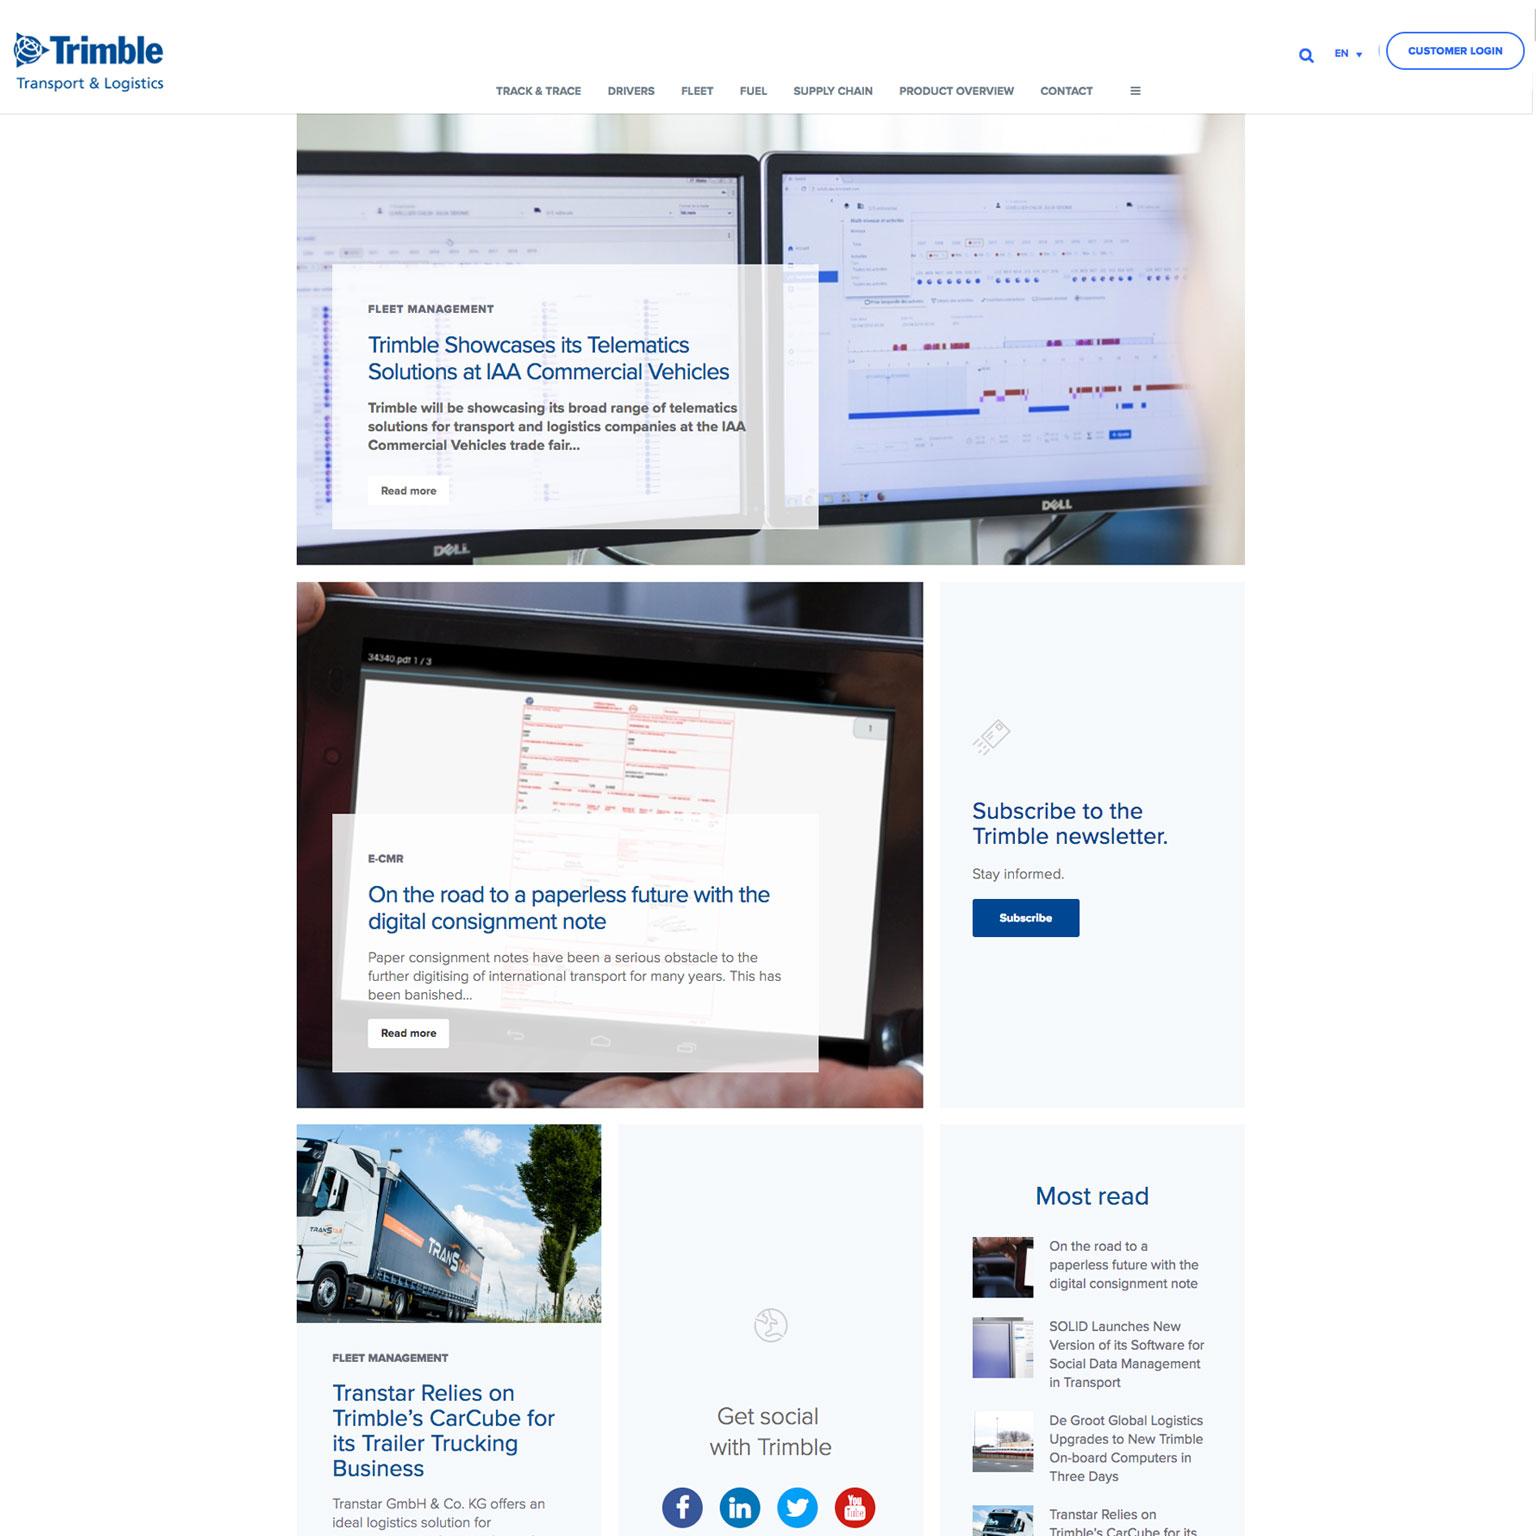 1536x1536-case-study-trimbletl-blog-overview